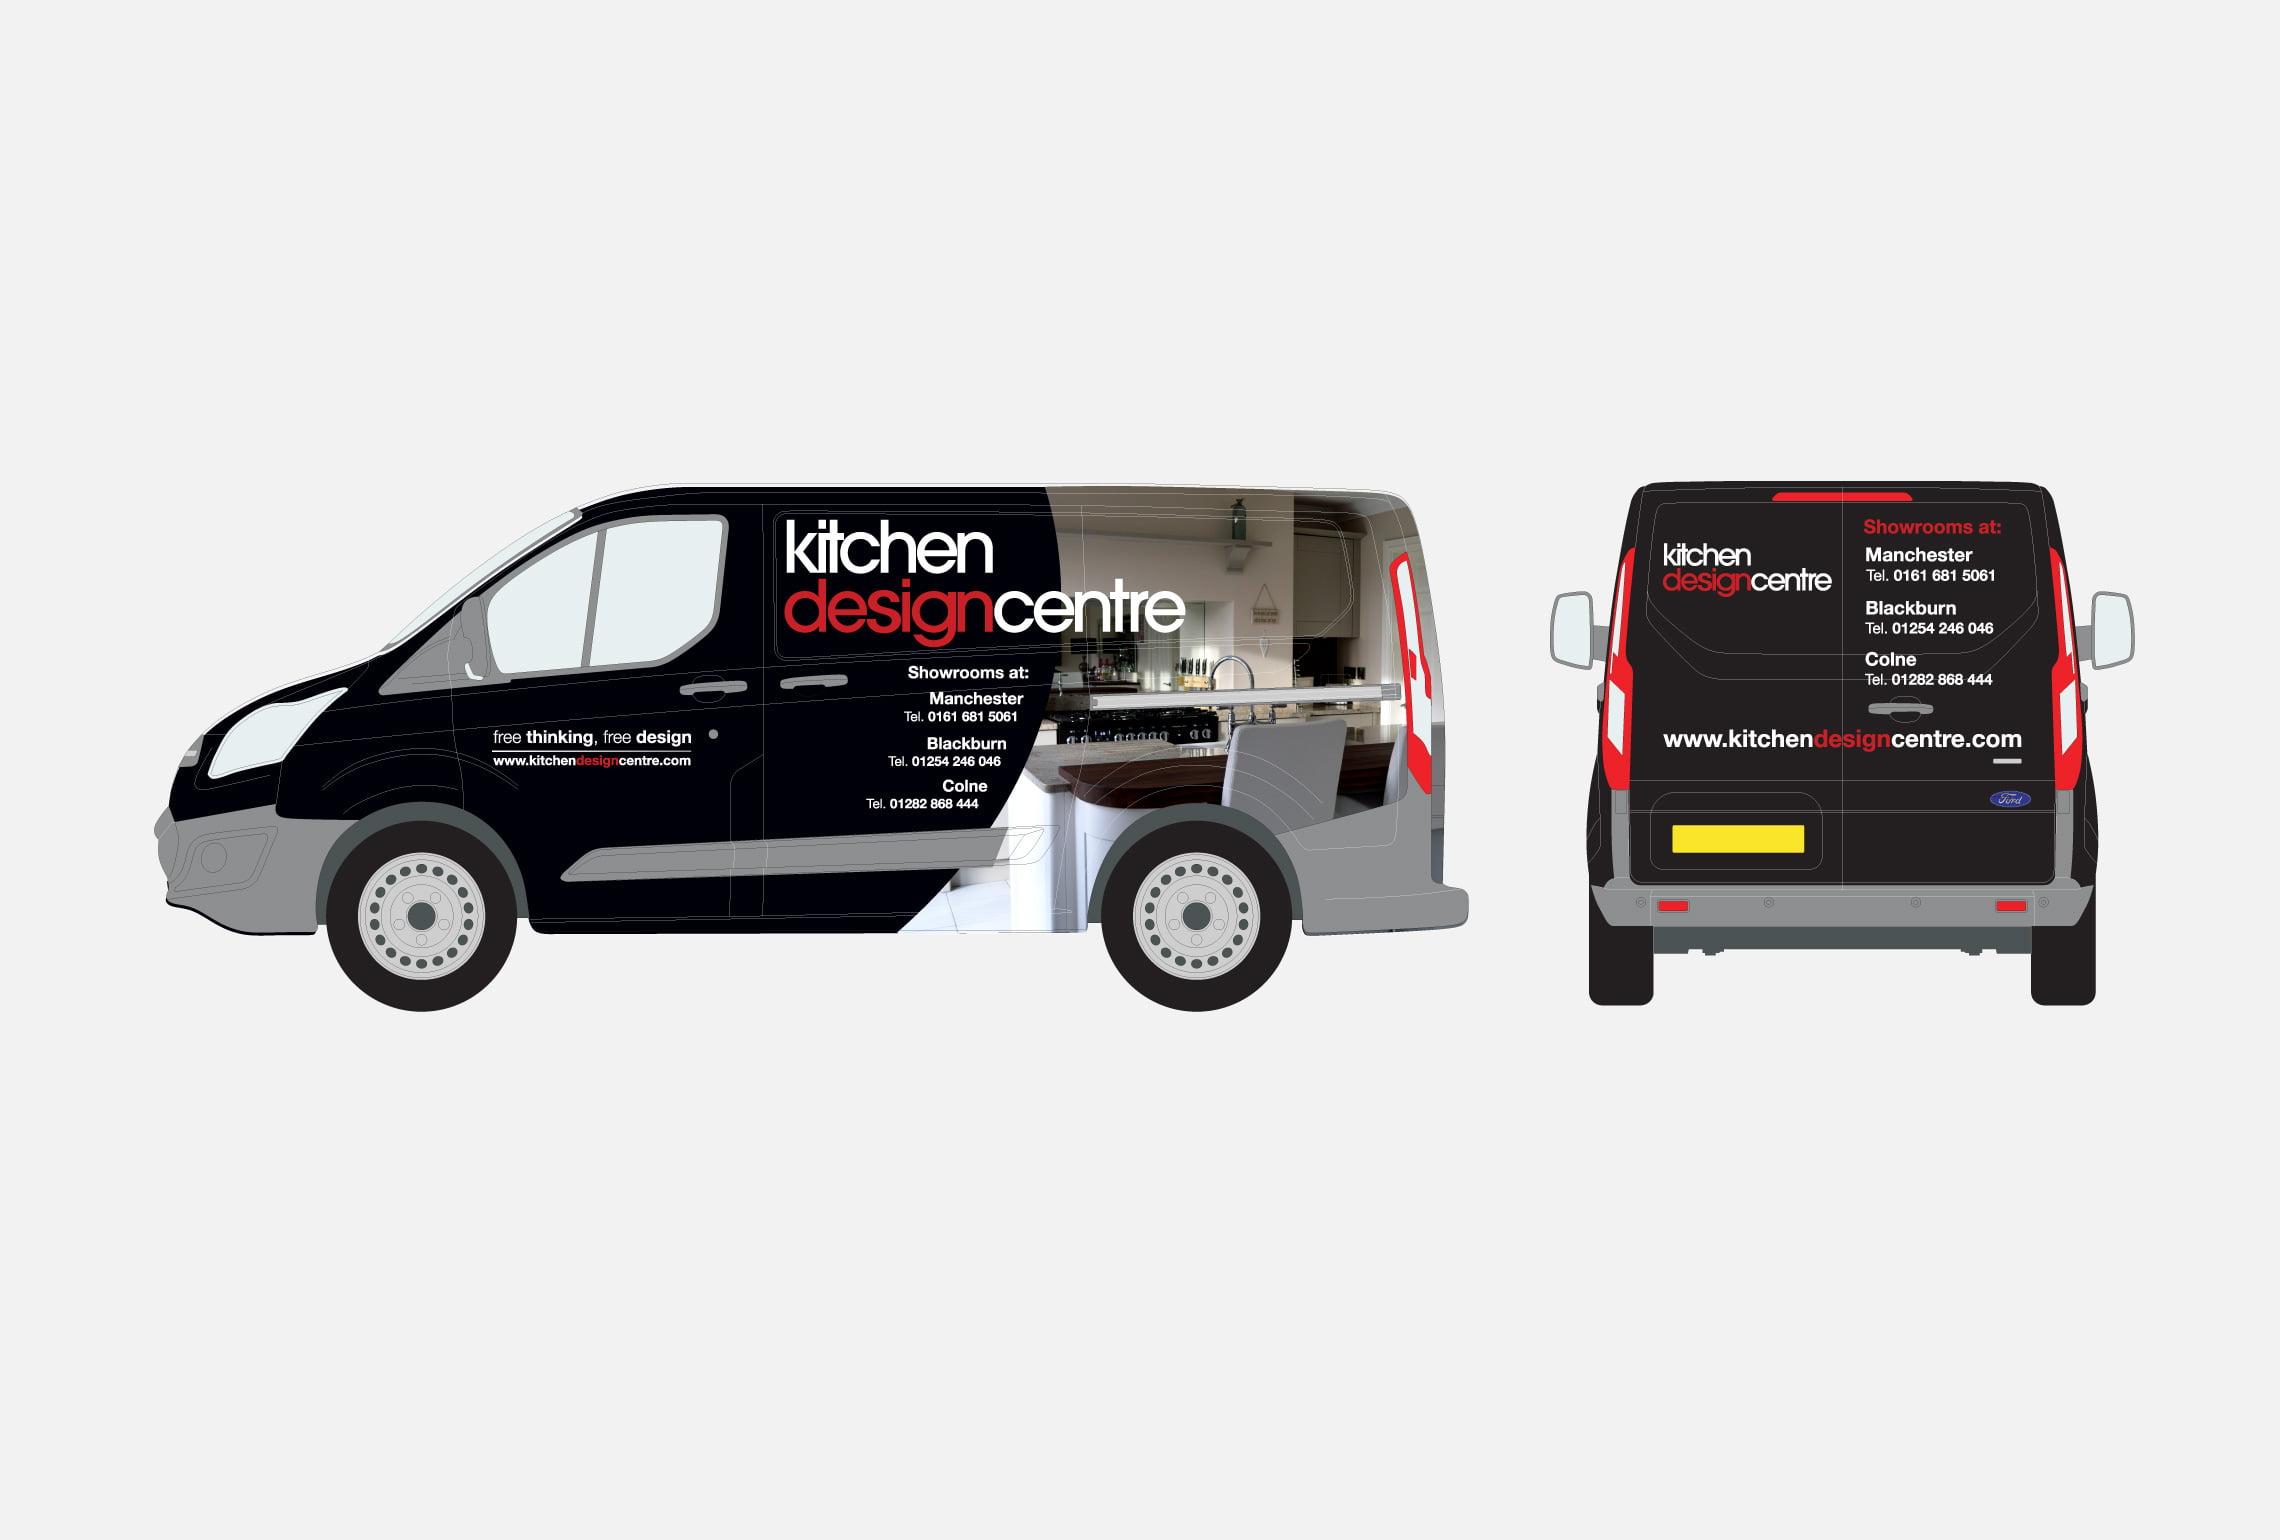 Kitchen Design Centre - Van Wrap